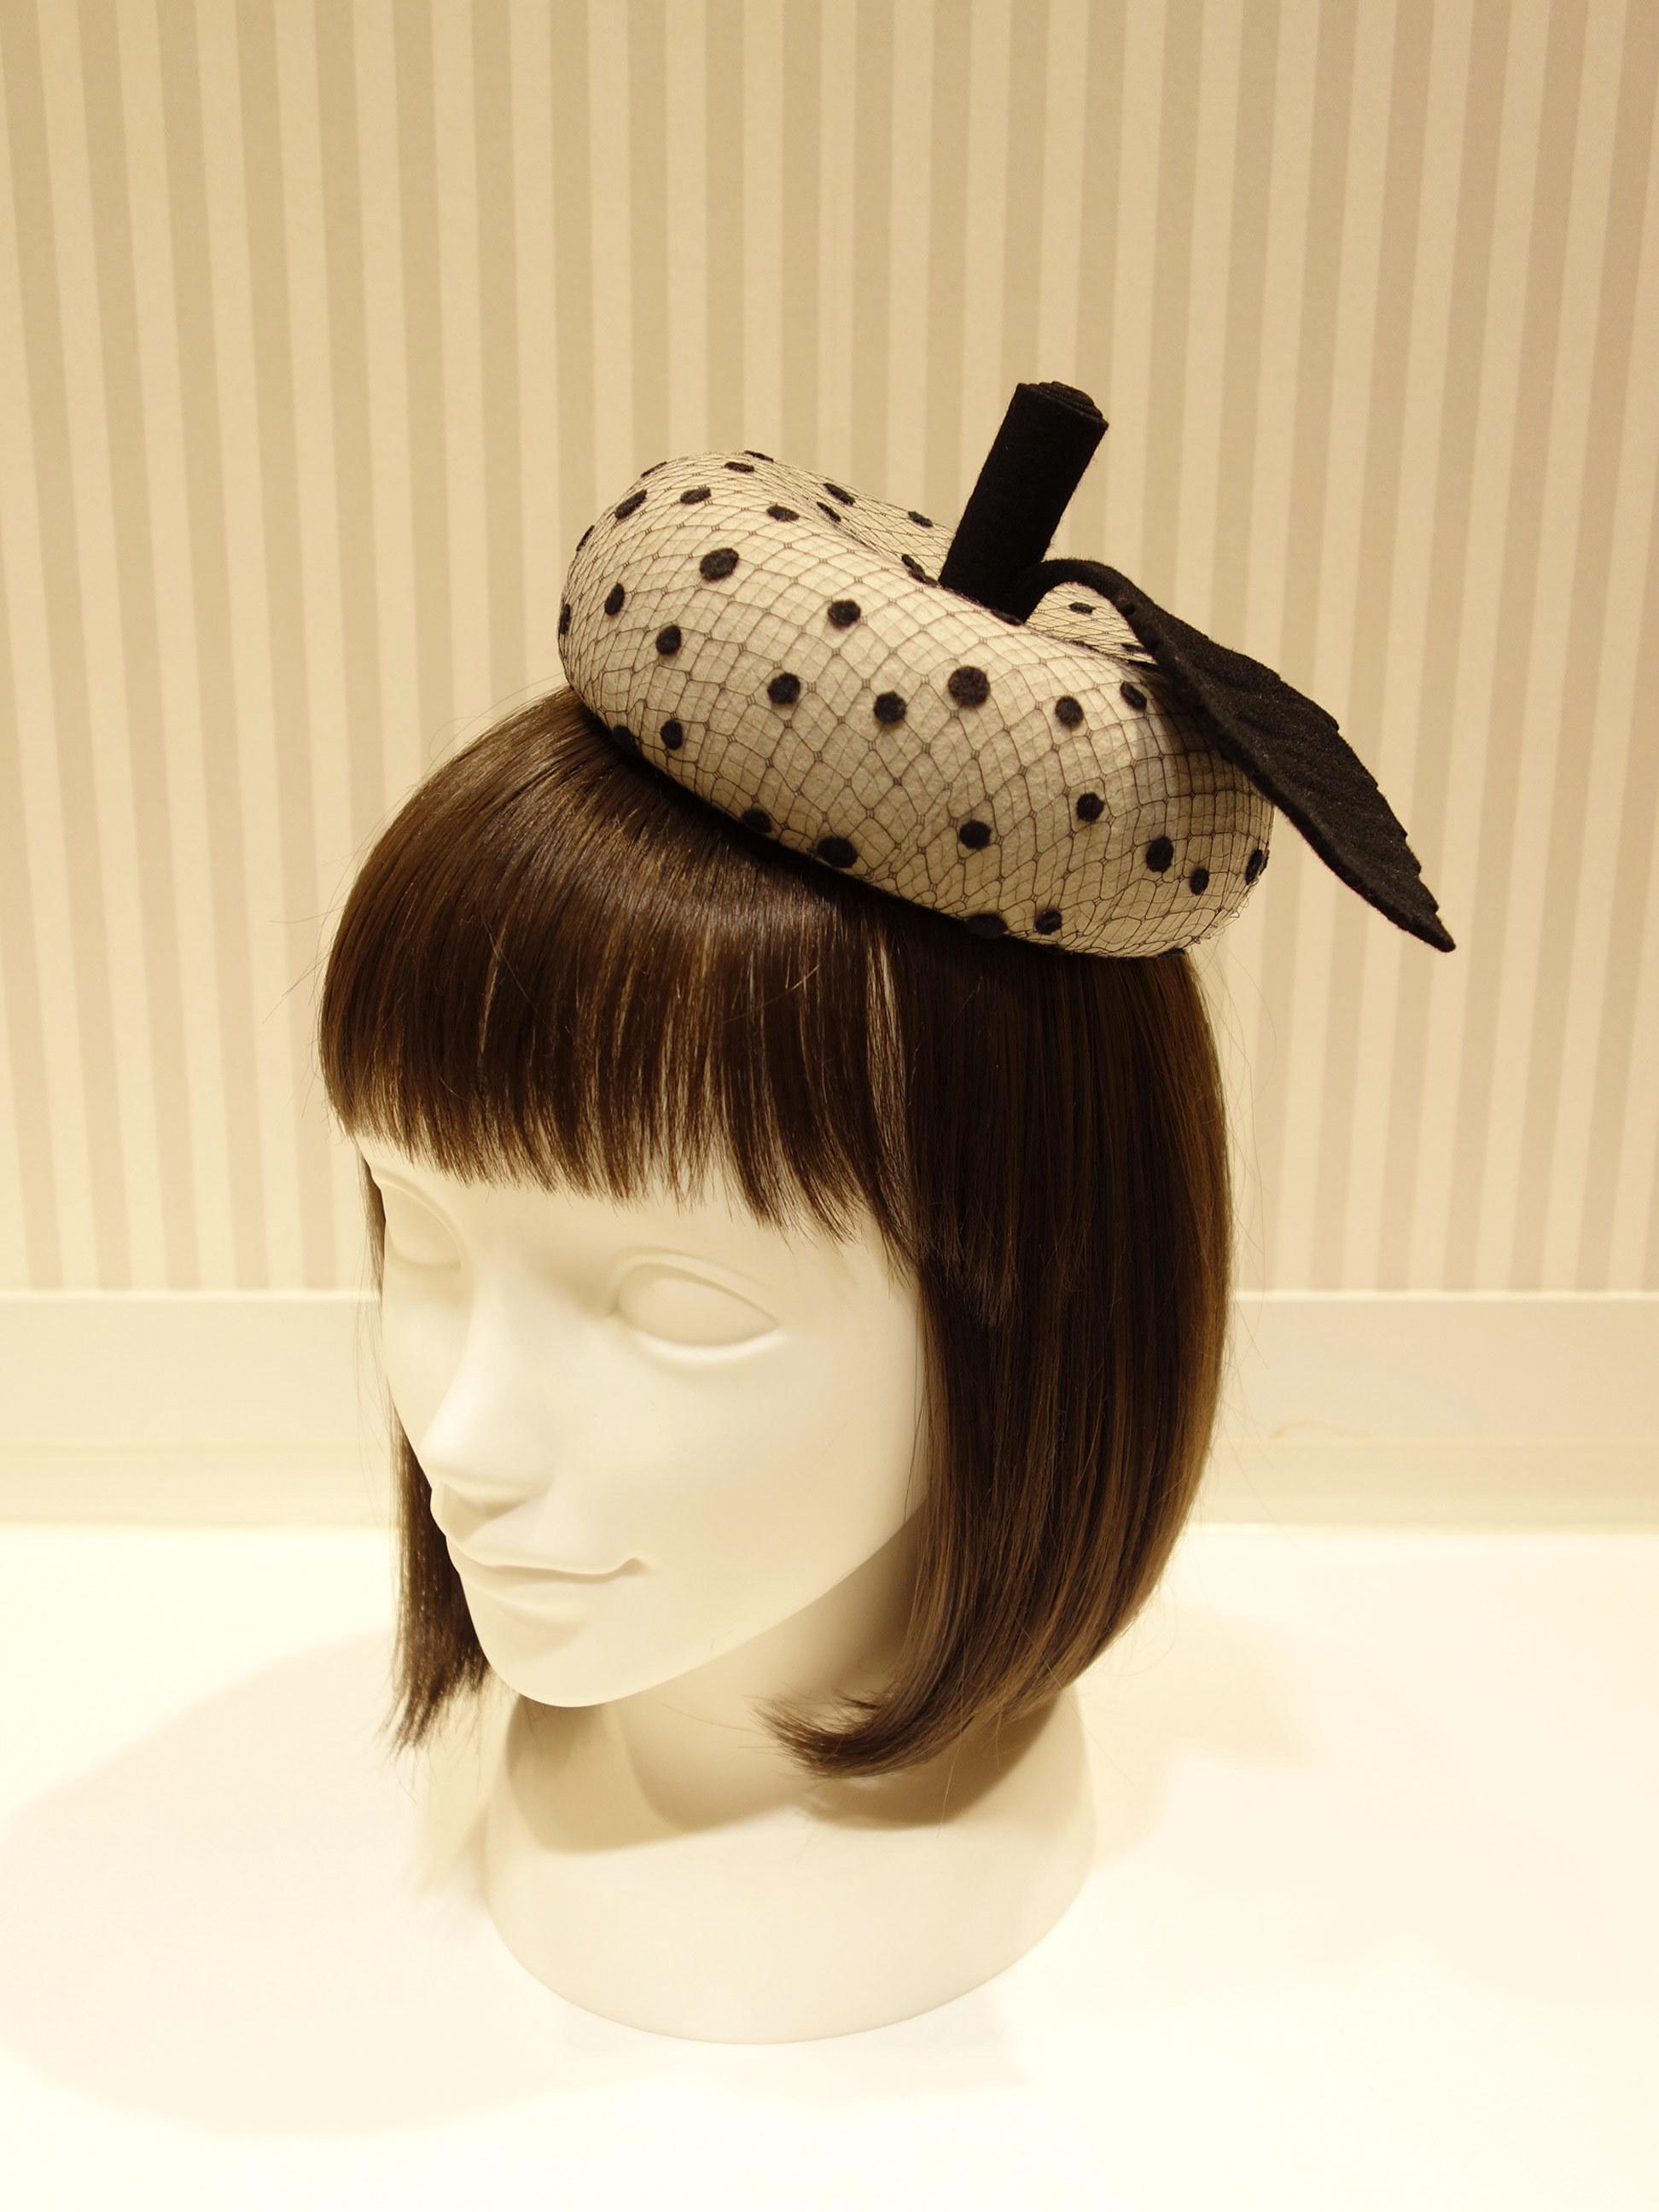 Chapon新作帽子*入荷しました*_e0167832_17590367.jpg